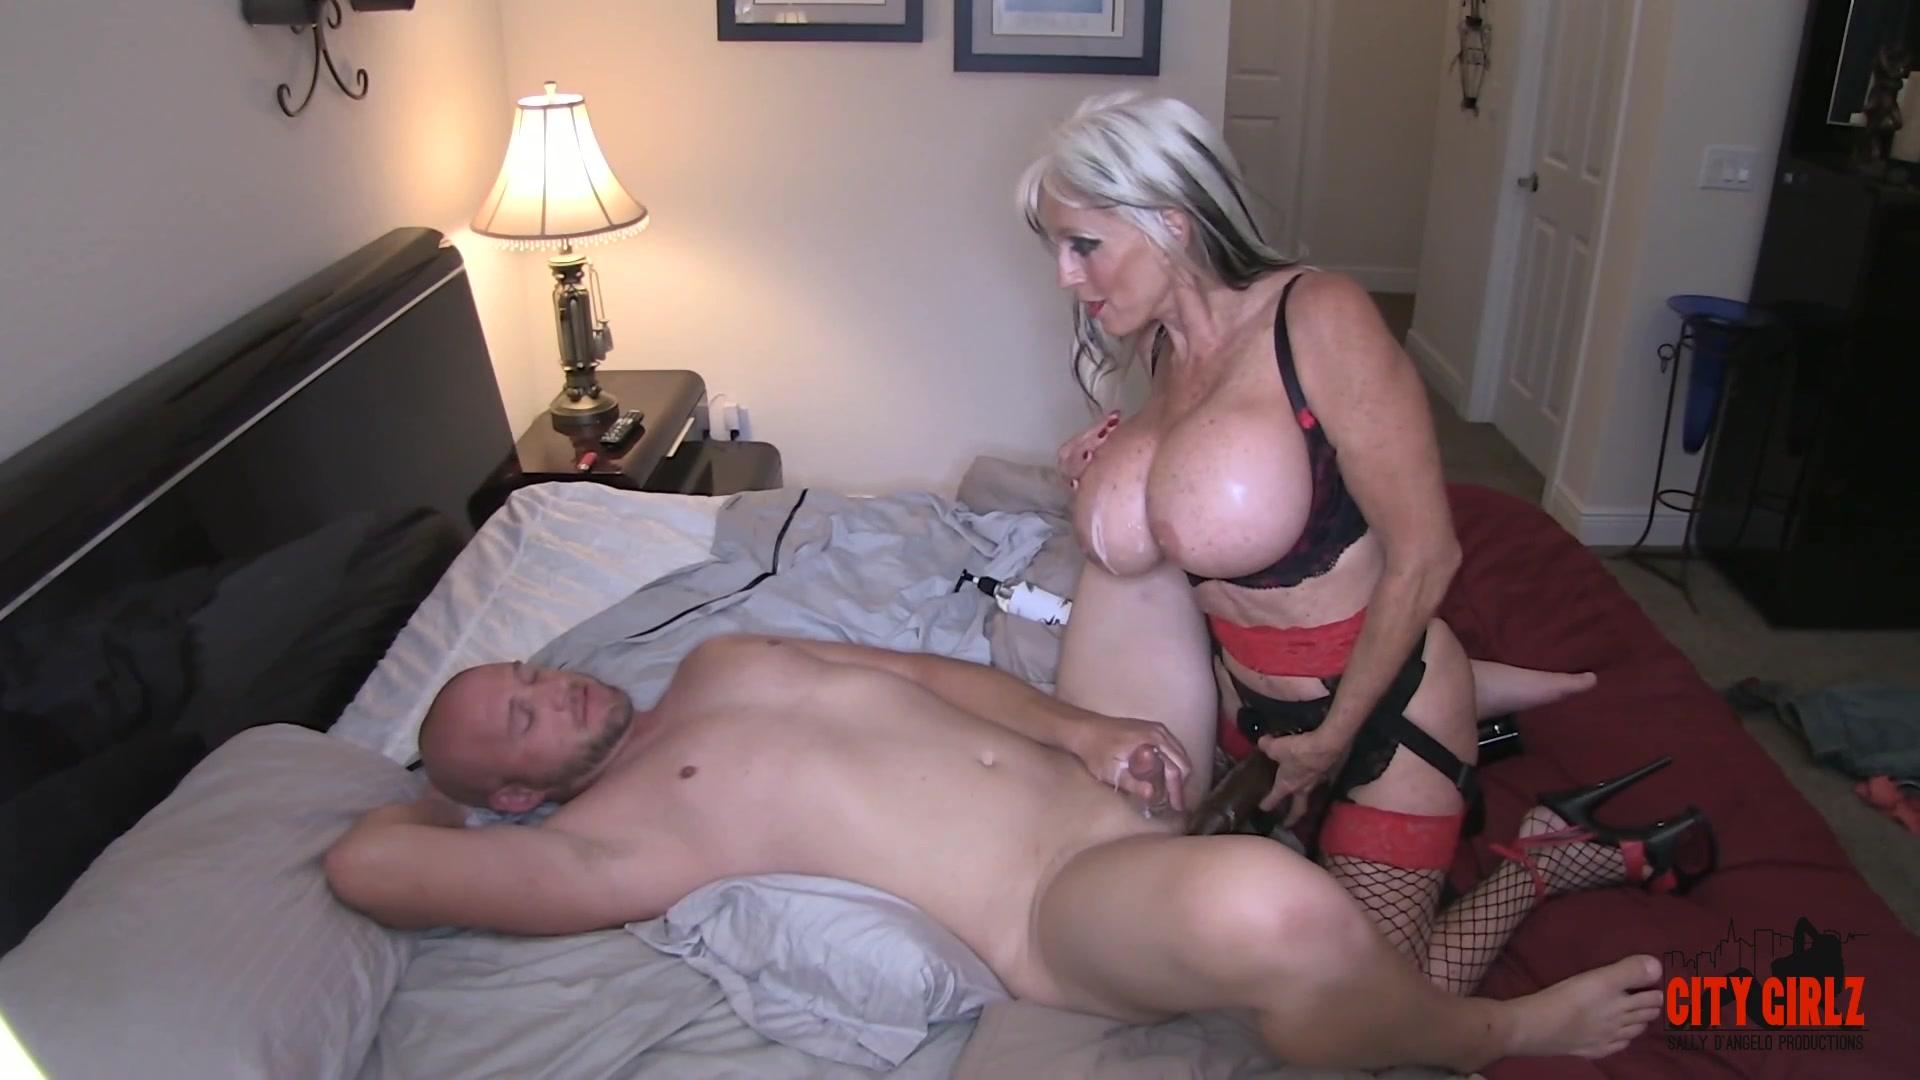 perfect latina pussy nude